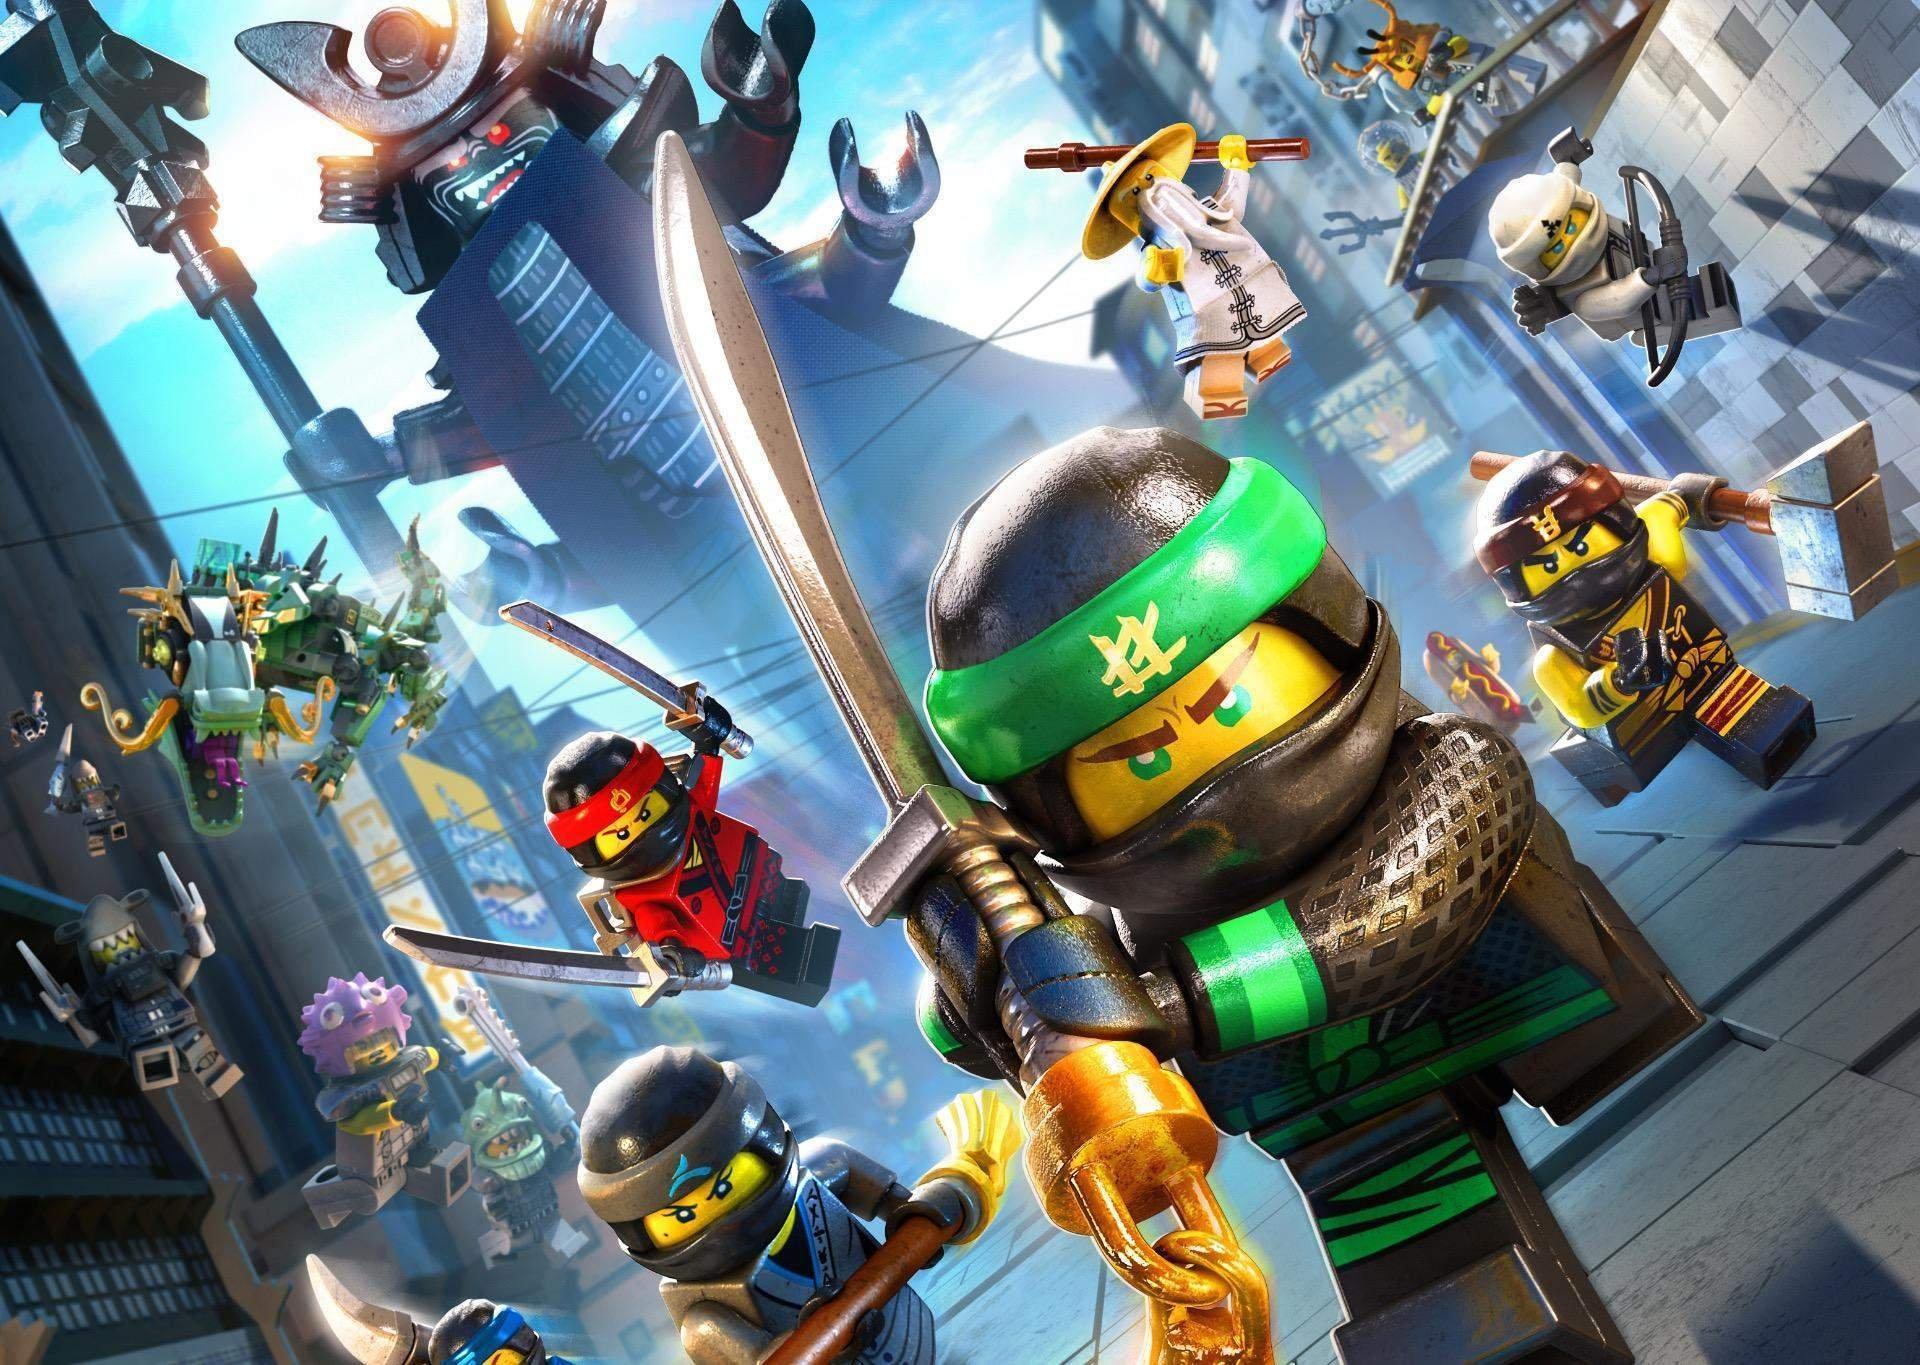 The Lego Ninjago Movie Review | The Mad Movie Man